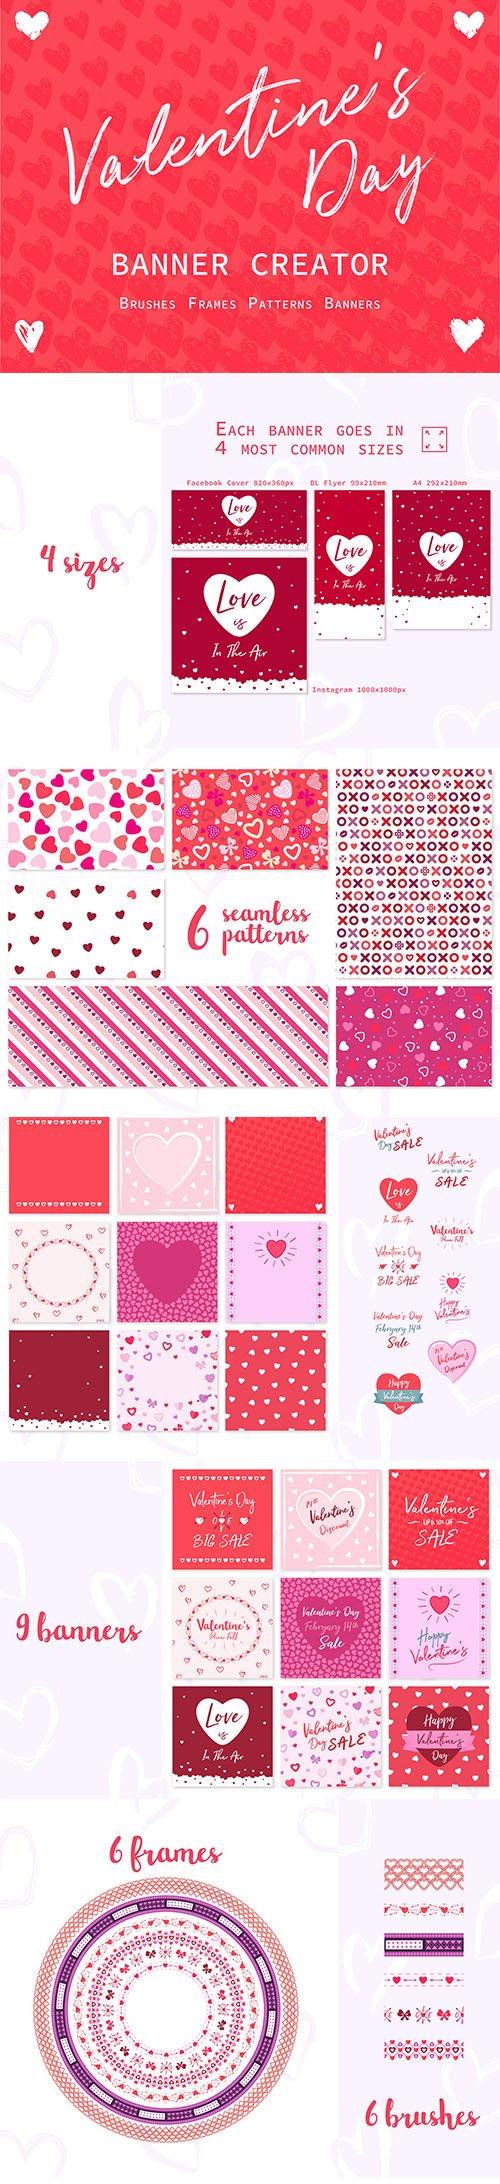 Valentines Day Banner Vector creator